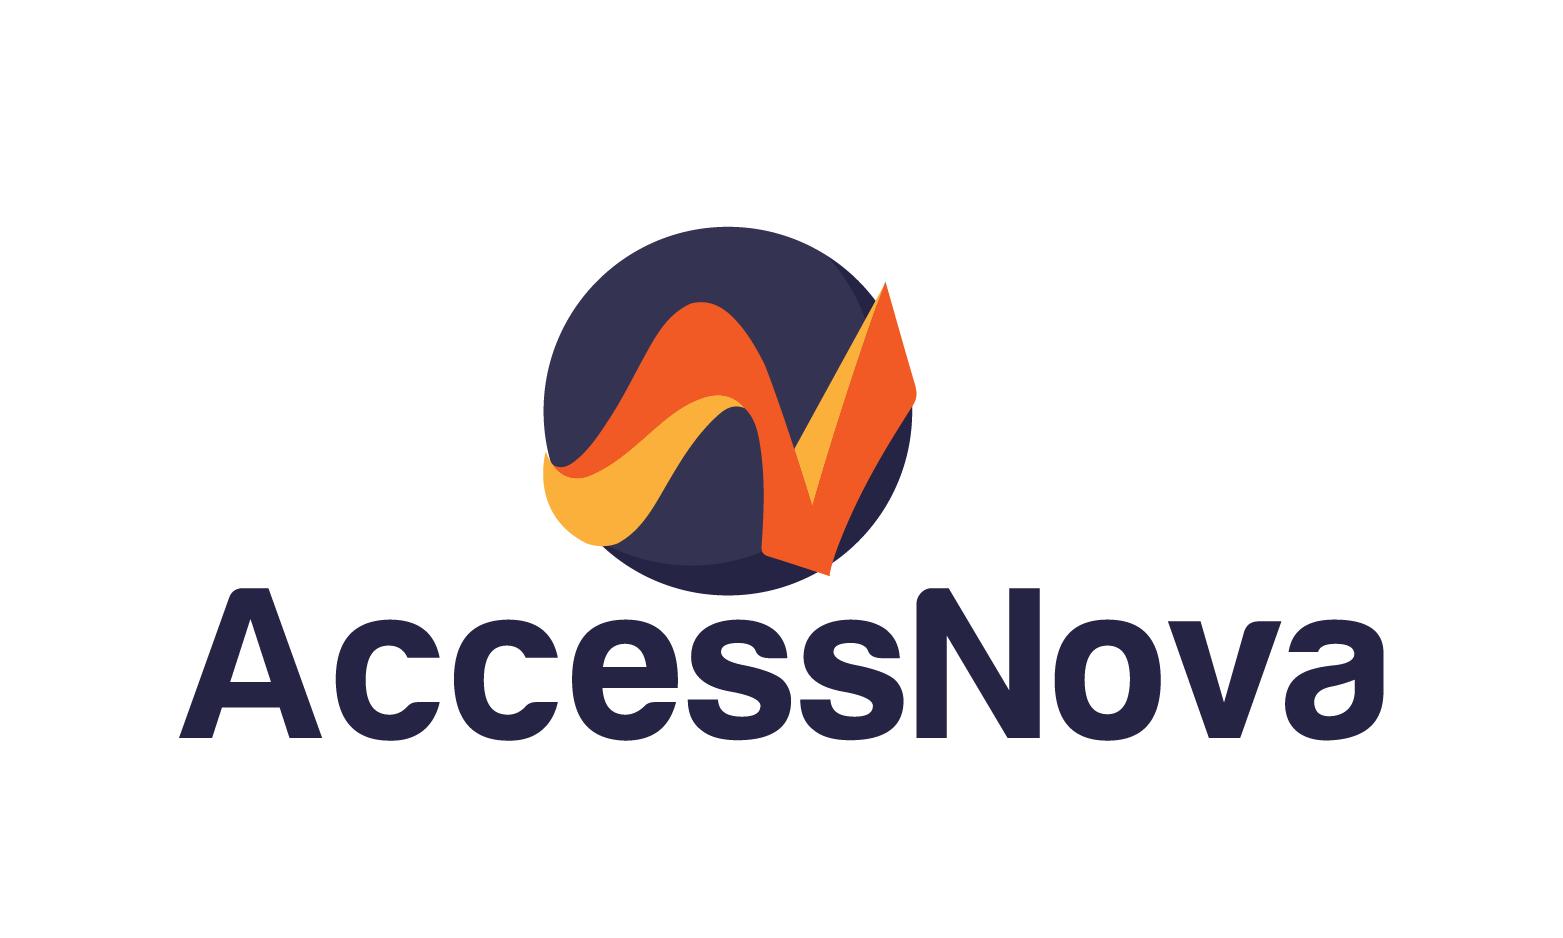 AccessNova.com